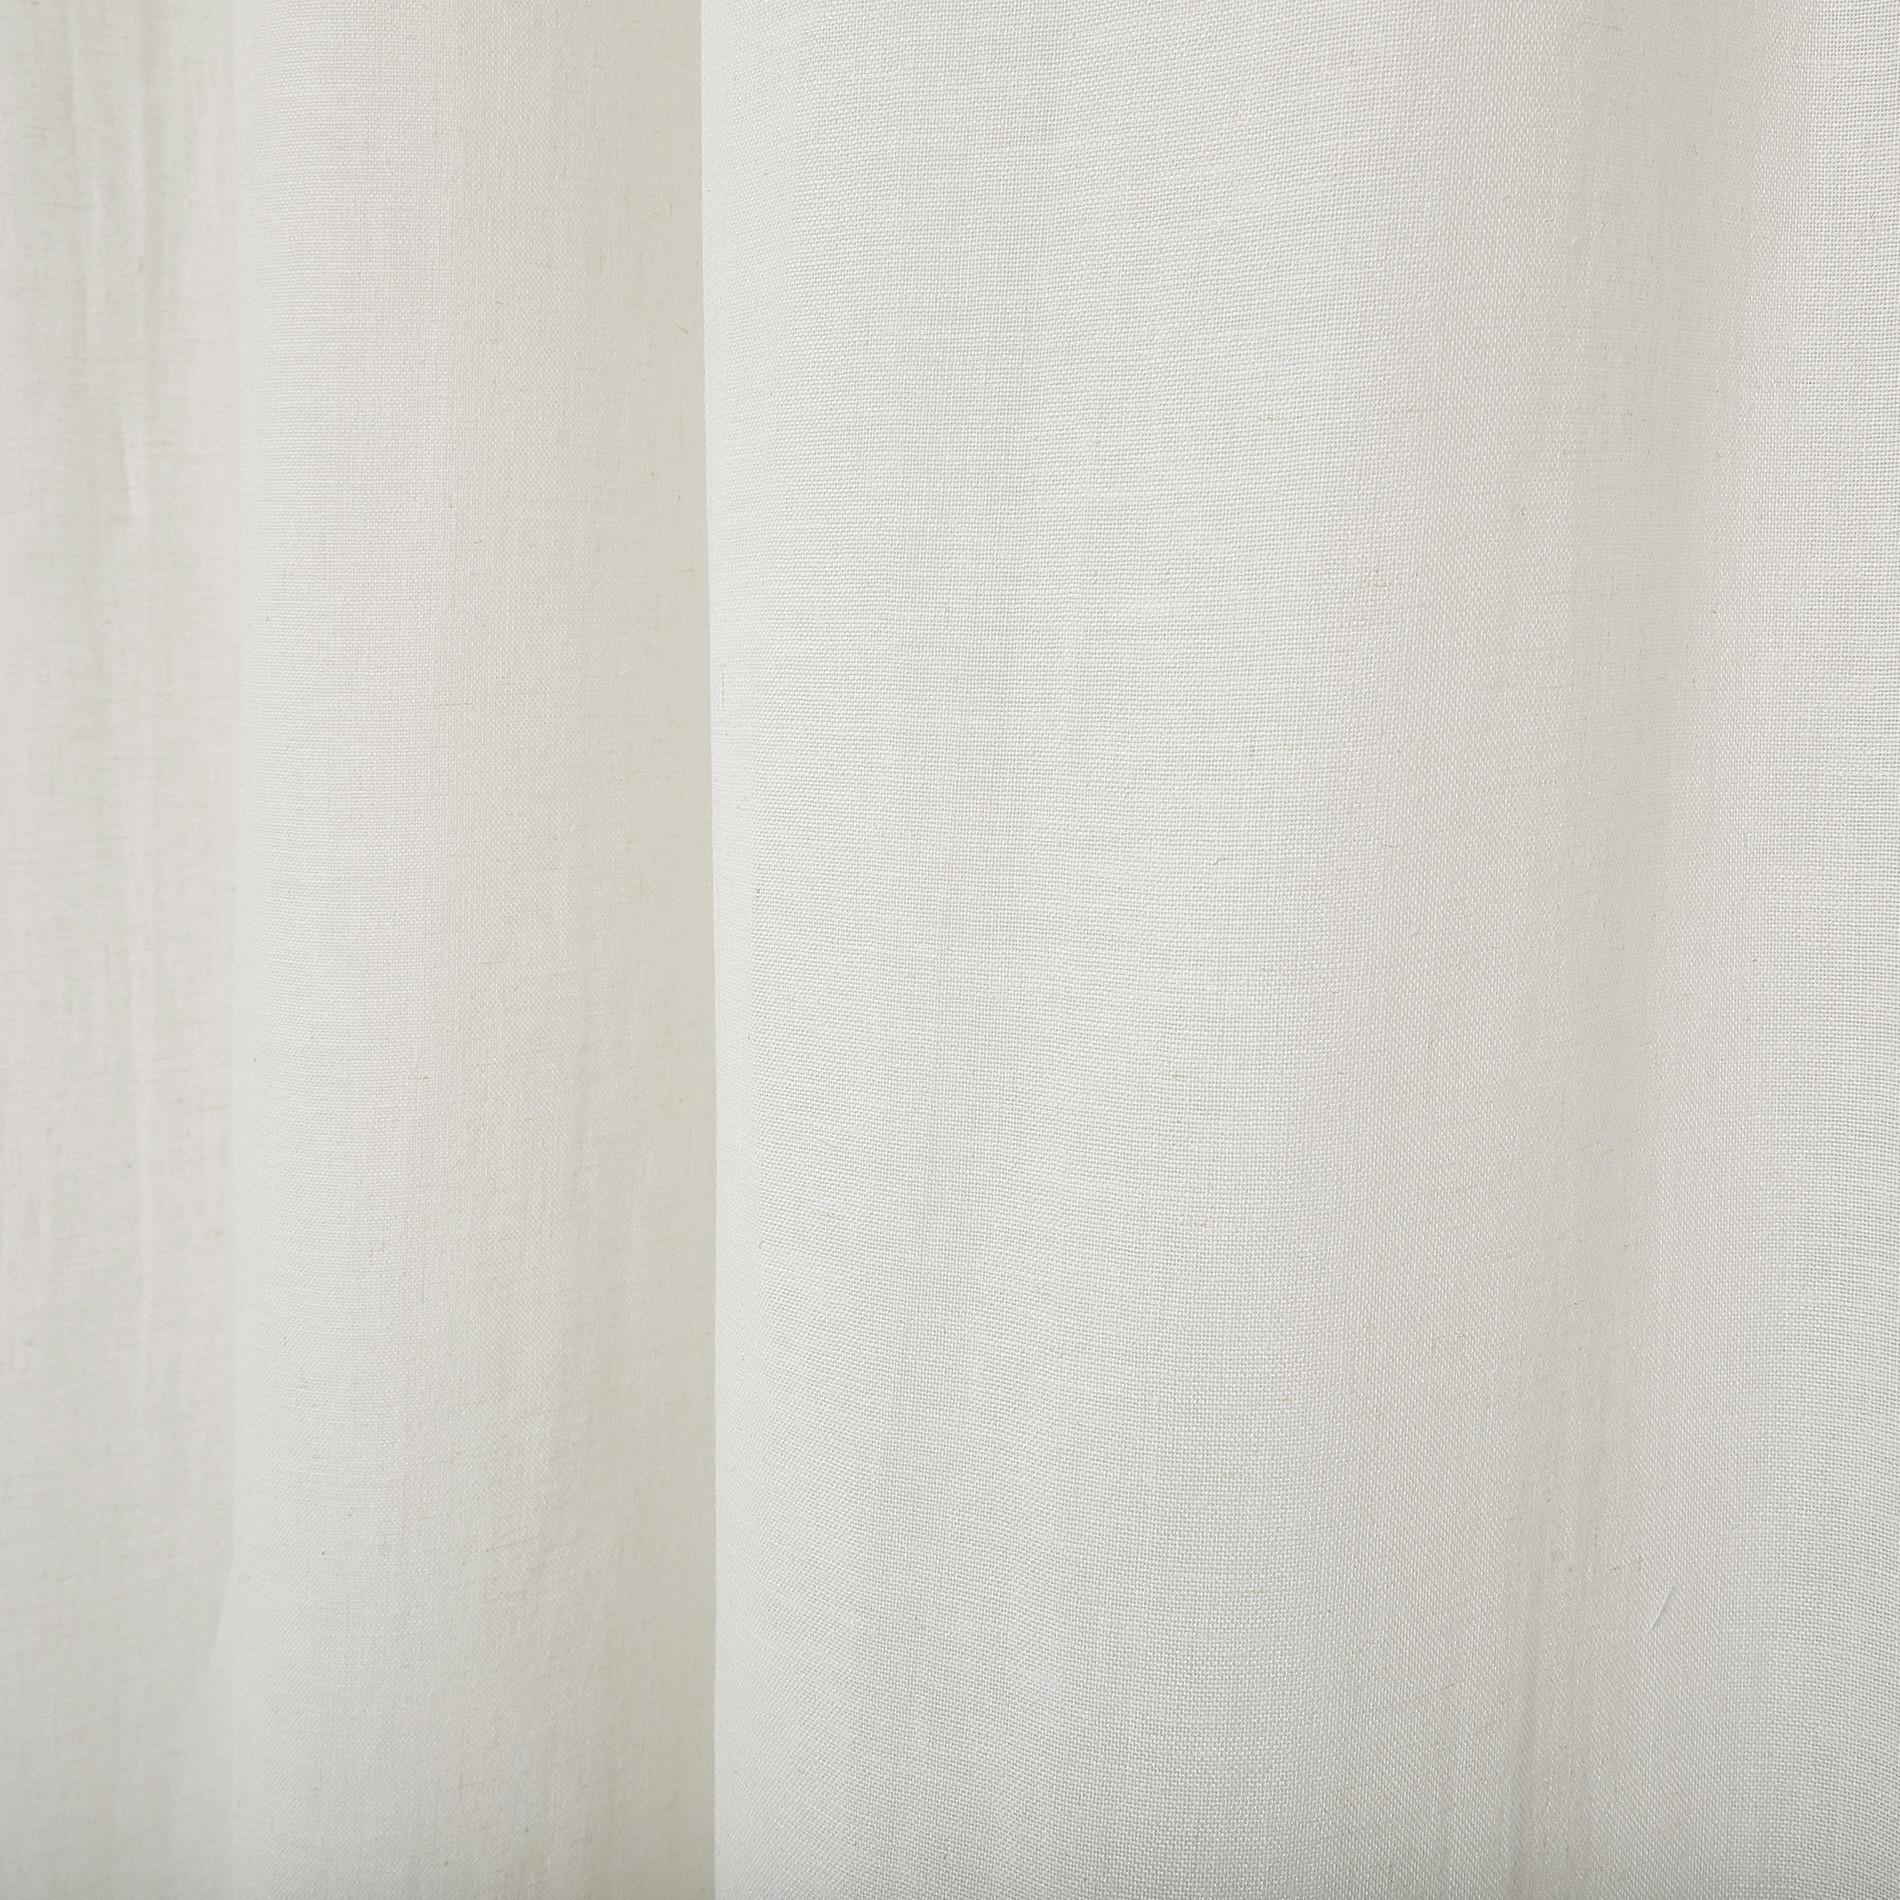 Tenda misto lino con passanti nascosti, Bianco, large image number 0